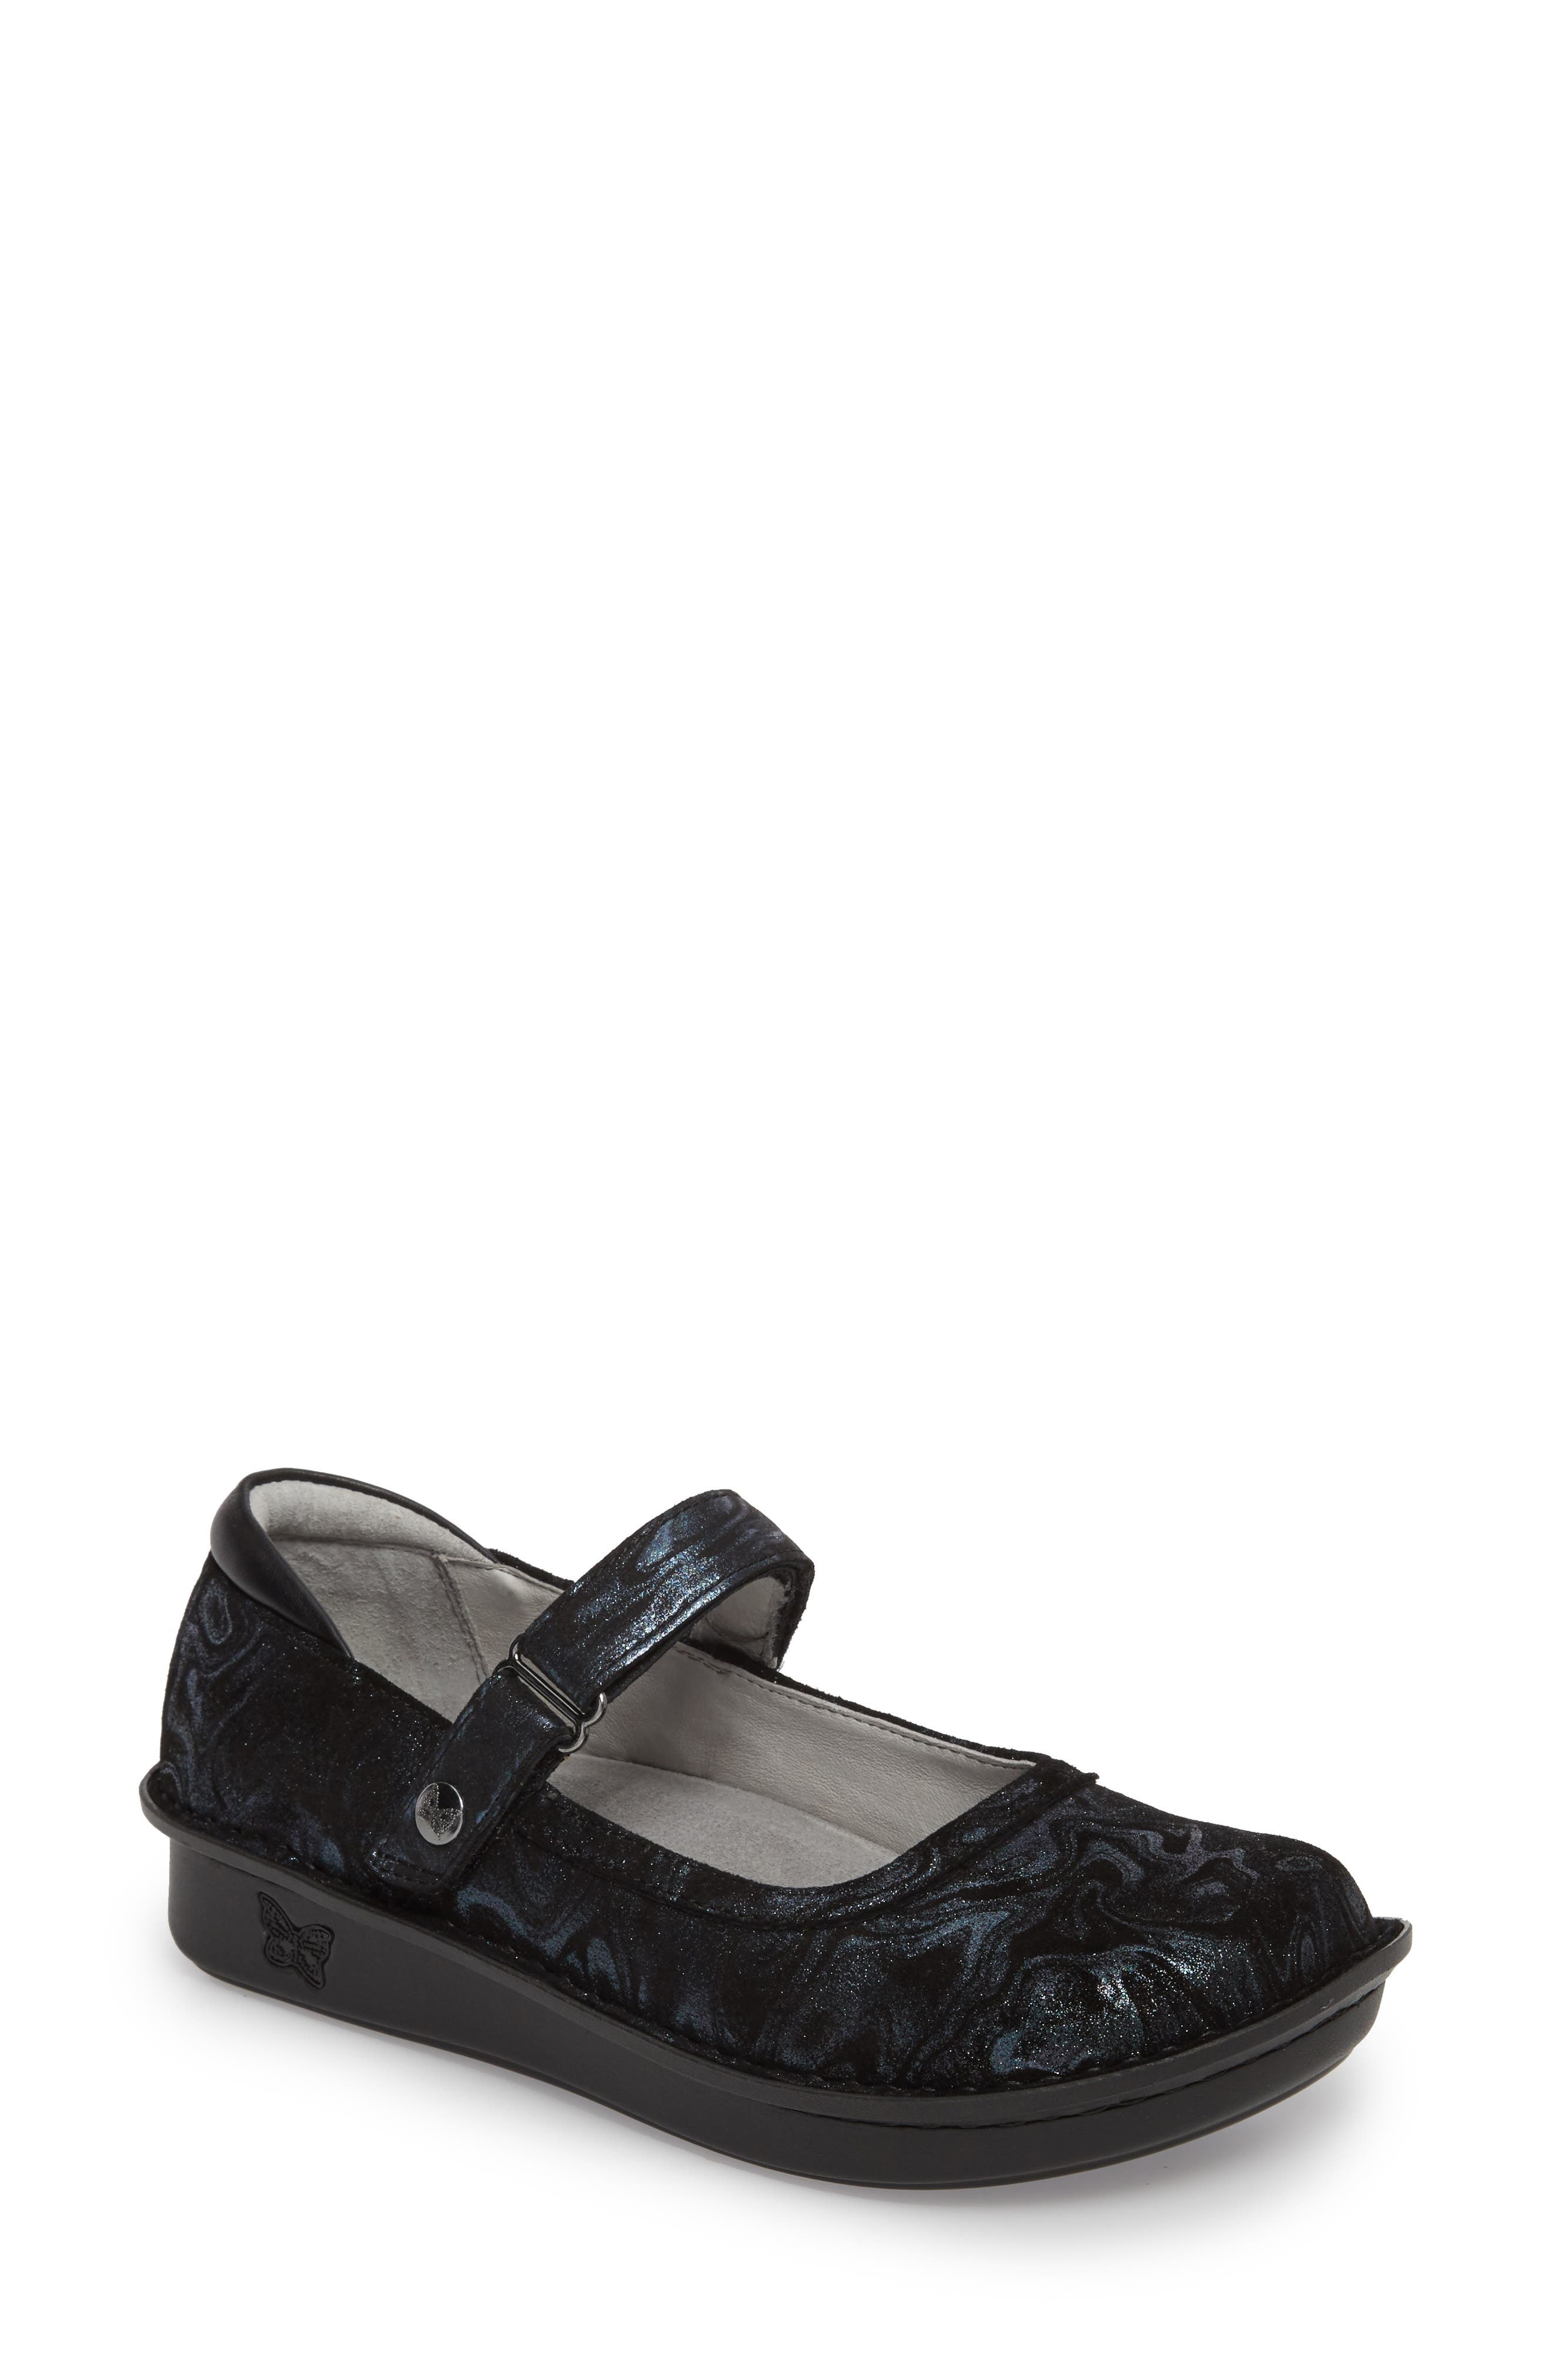 'Belle' Slip-On,                         Main,                         color, Slickery Leather